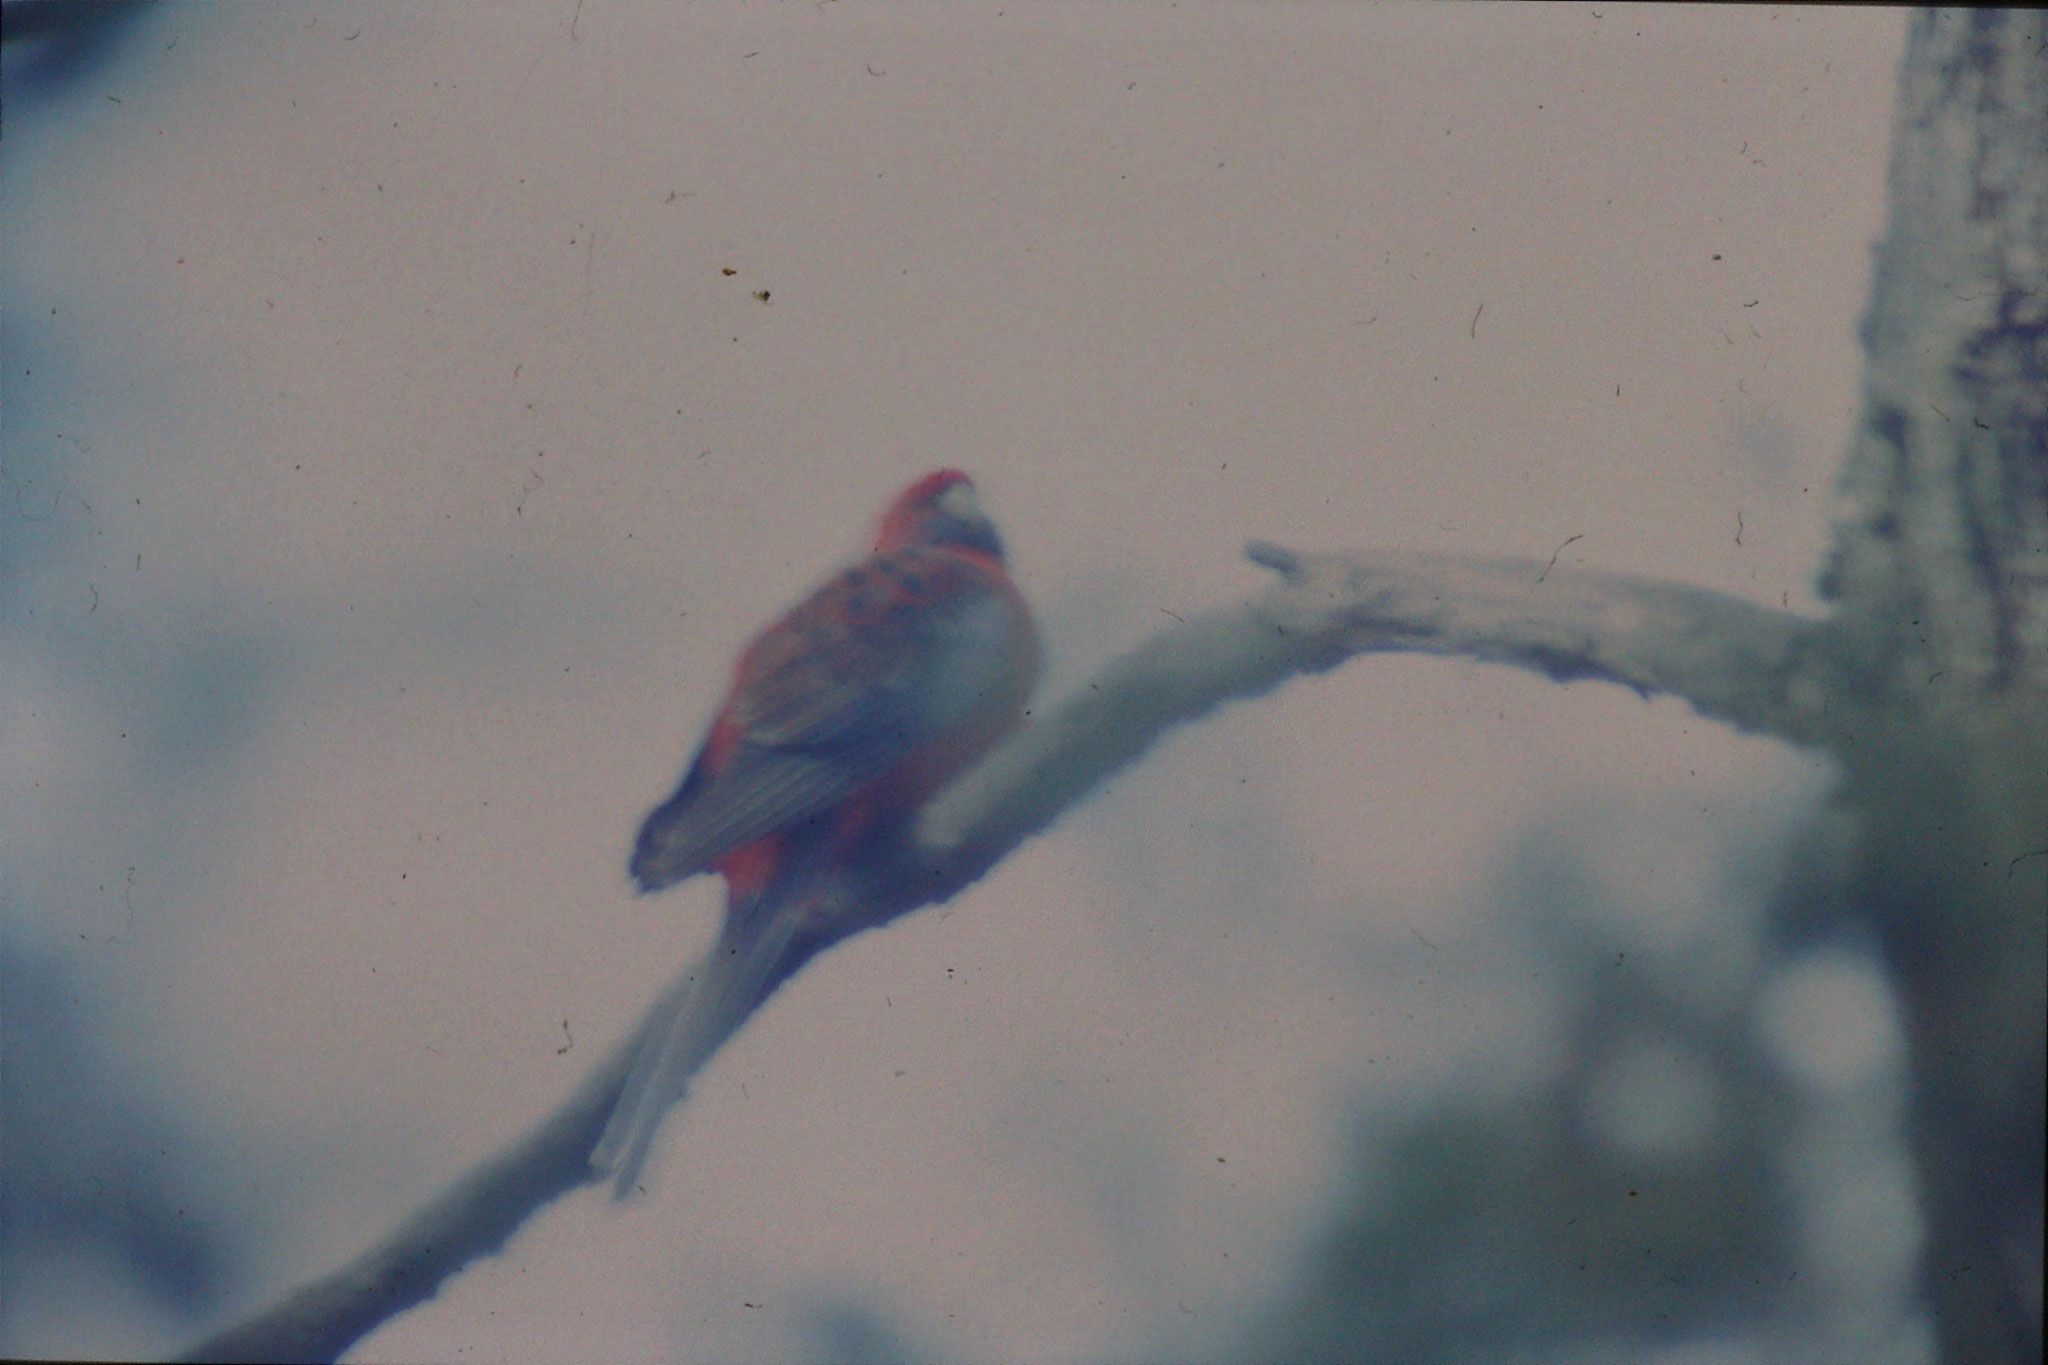 21/9/1990: 2: near Sundial picnic gound, crimson rosella